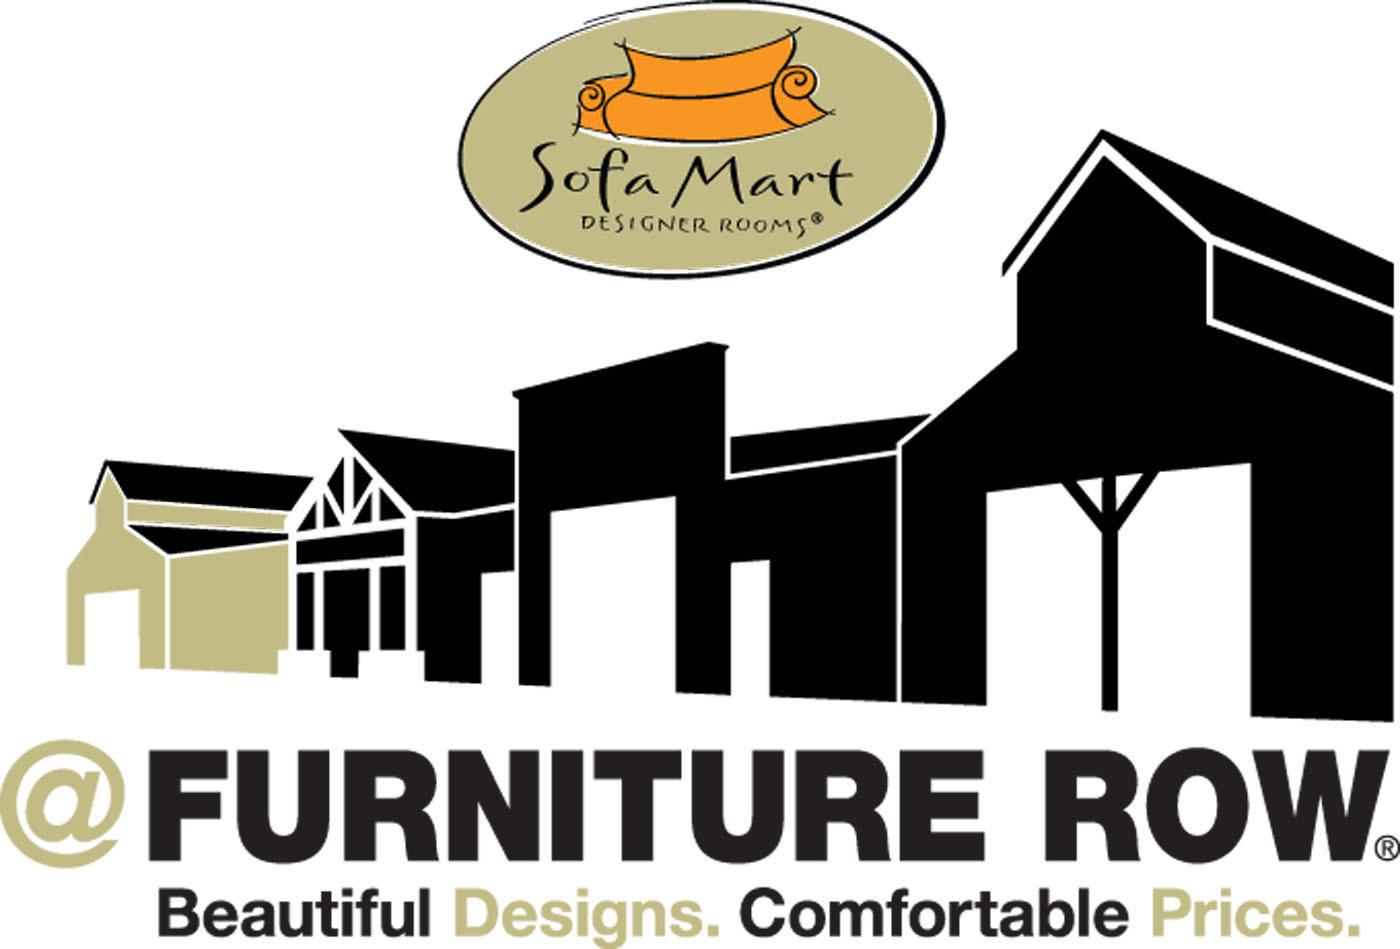 Sofa Mart revela un nuevo interior en Corpus Christi, TX : Hispanic PR Wire